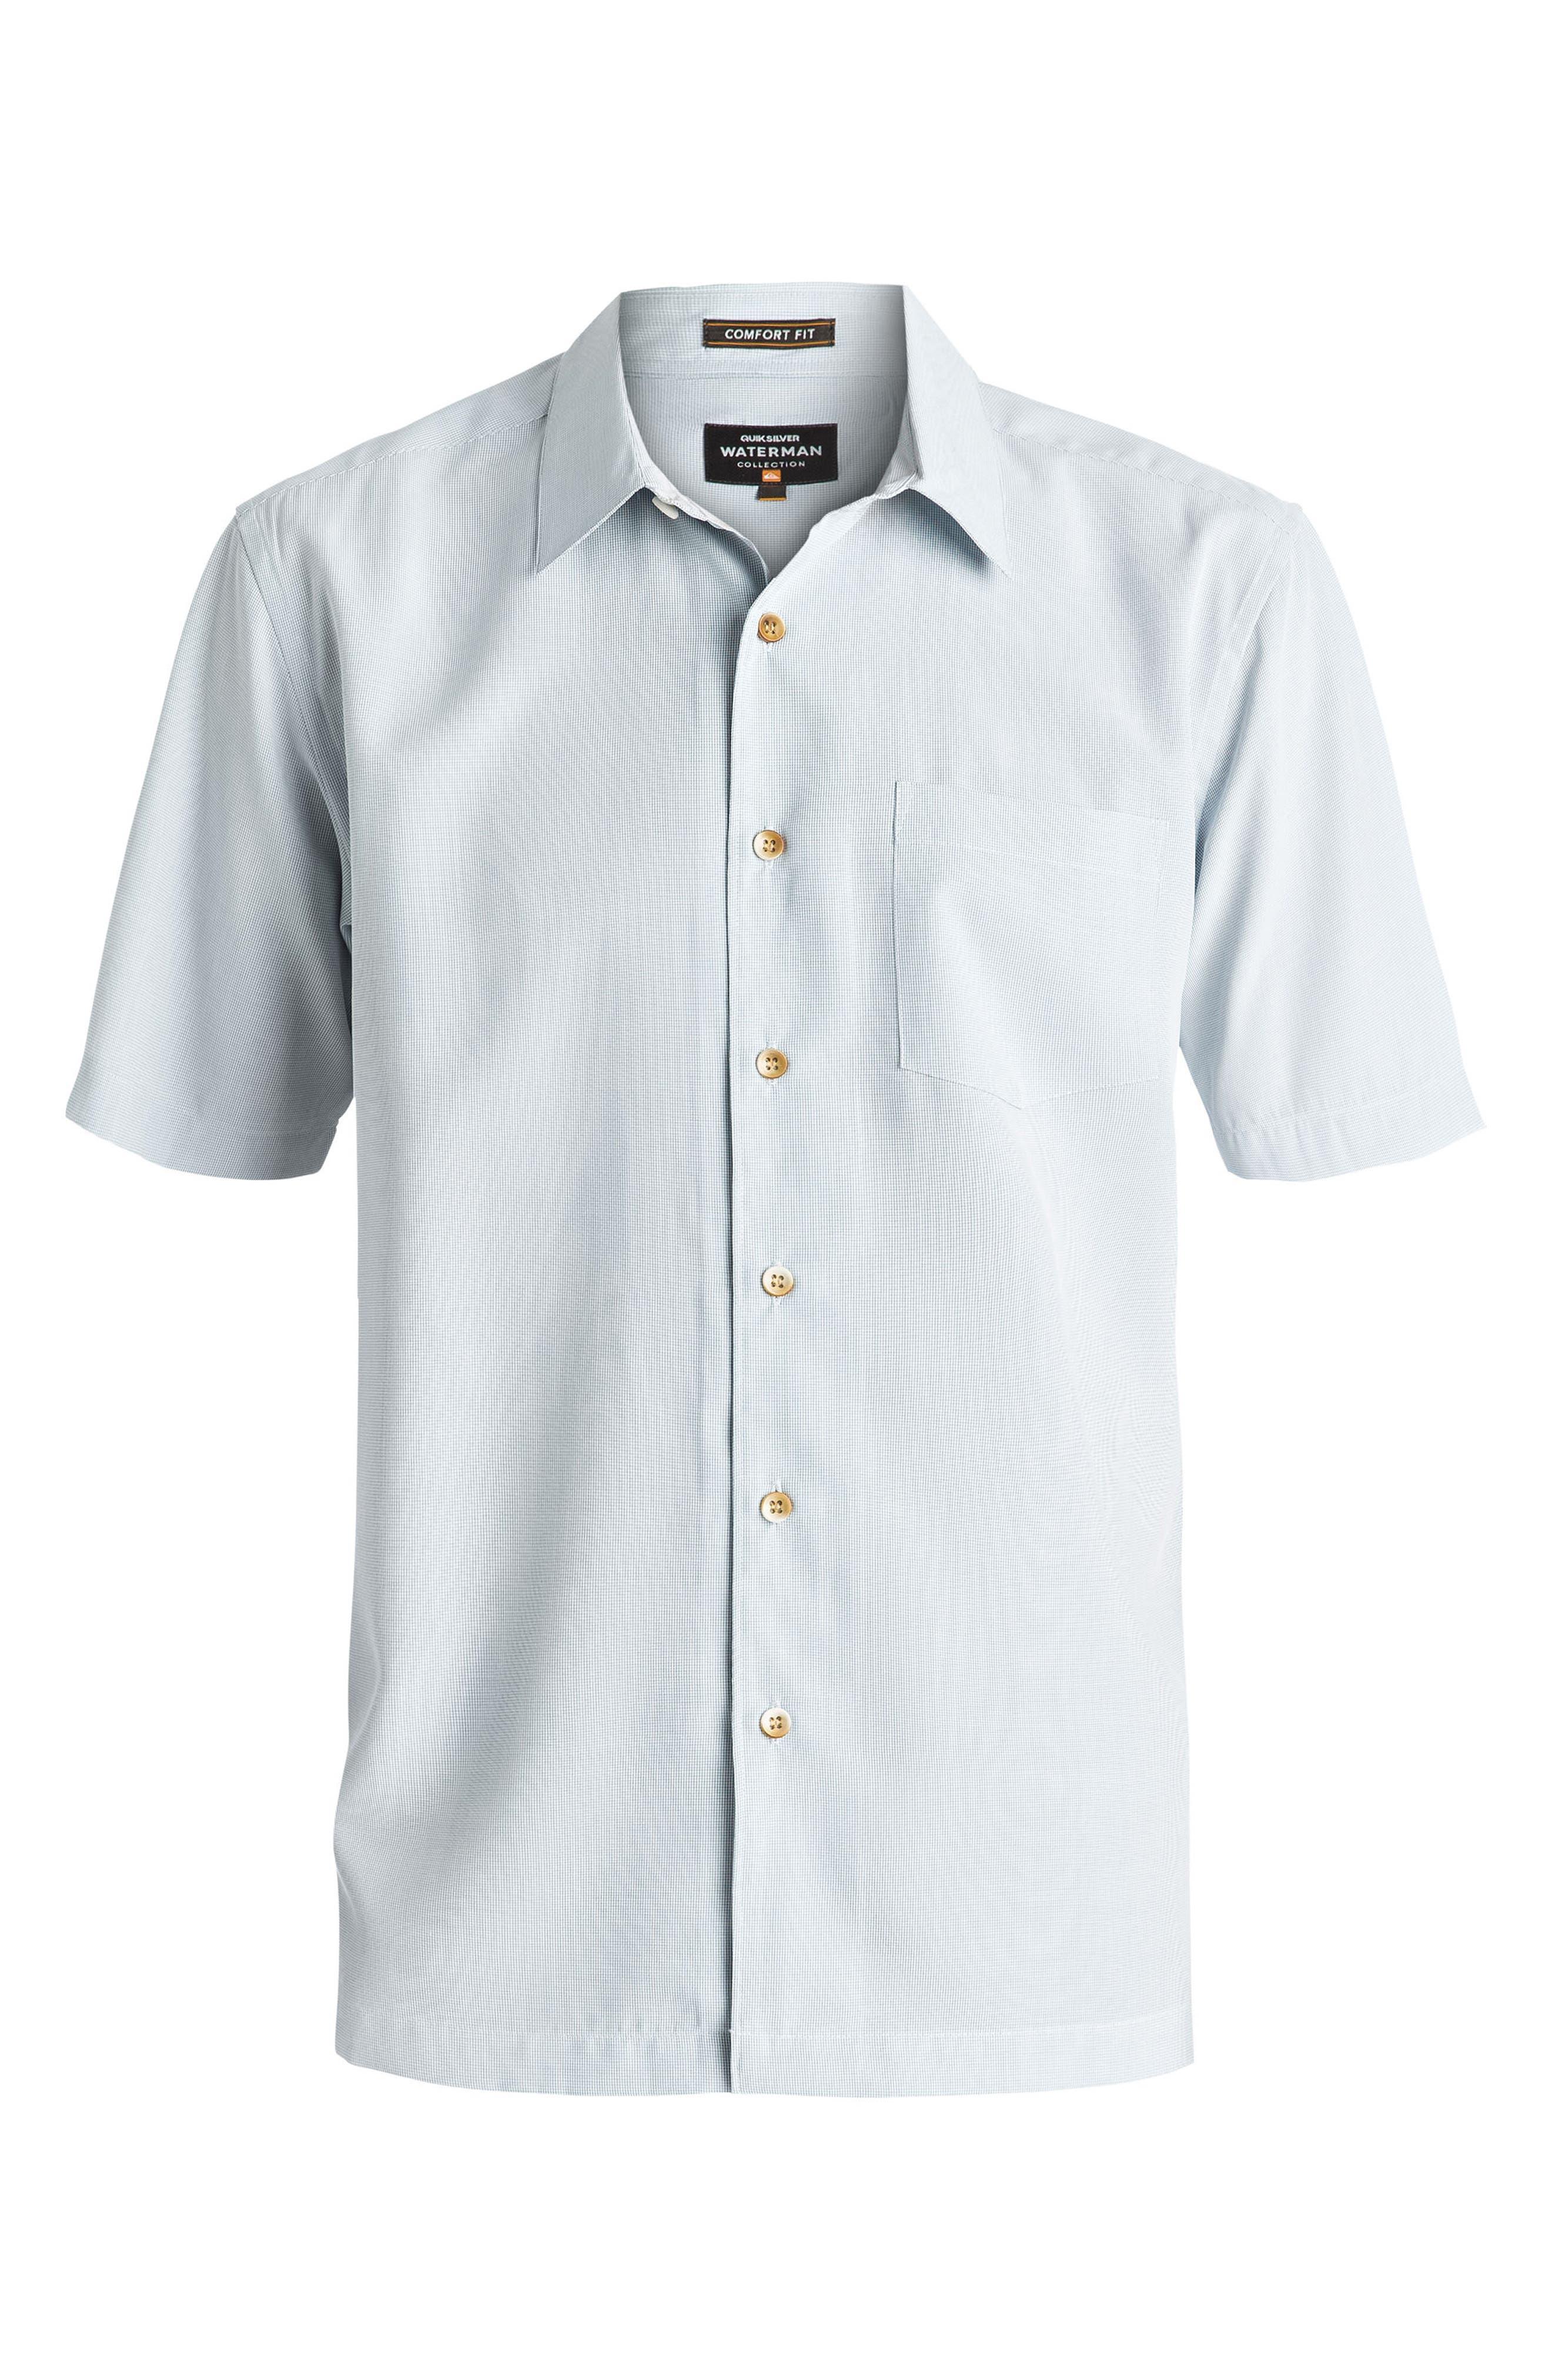 Alternate Image 3  - Quiksilver Waterman Collection 'Cane Island' Regular Fit Short Sleeve Sport Shirt